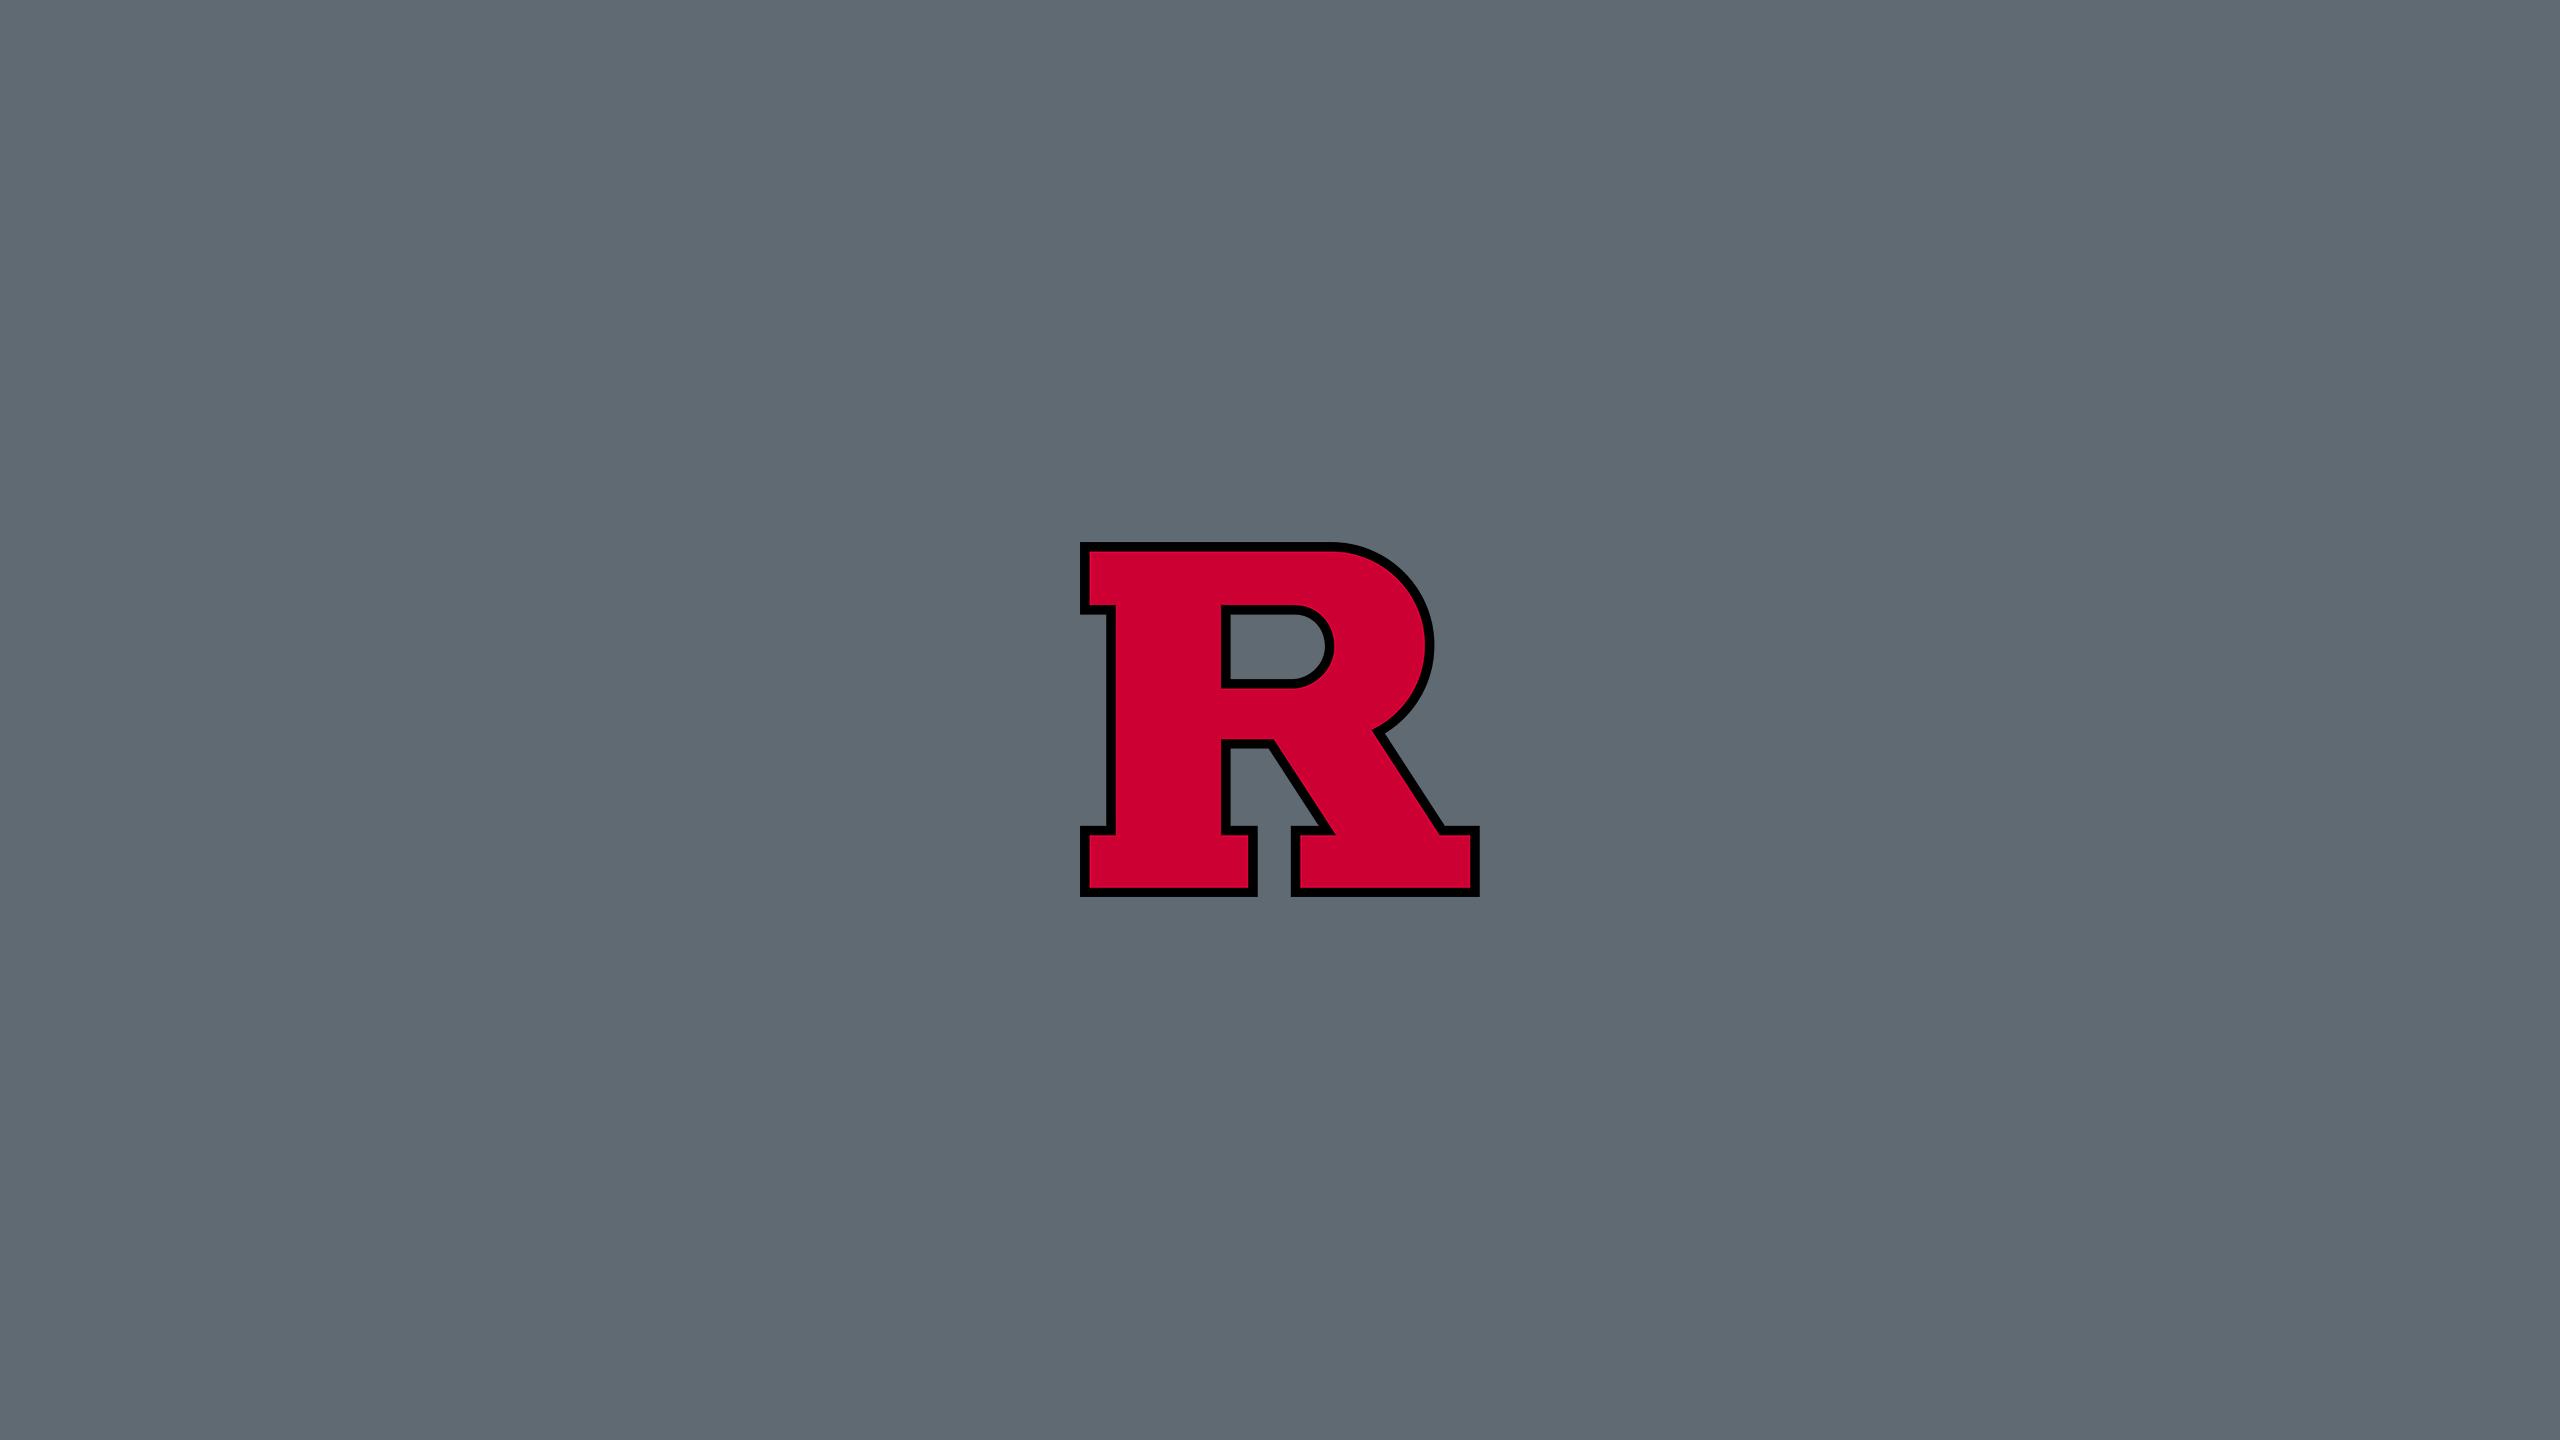 Rutgers University Scarlet Knights